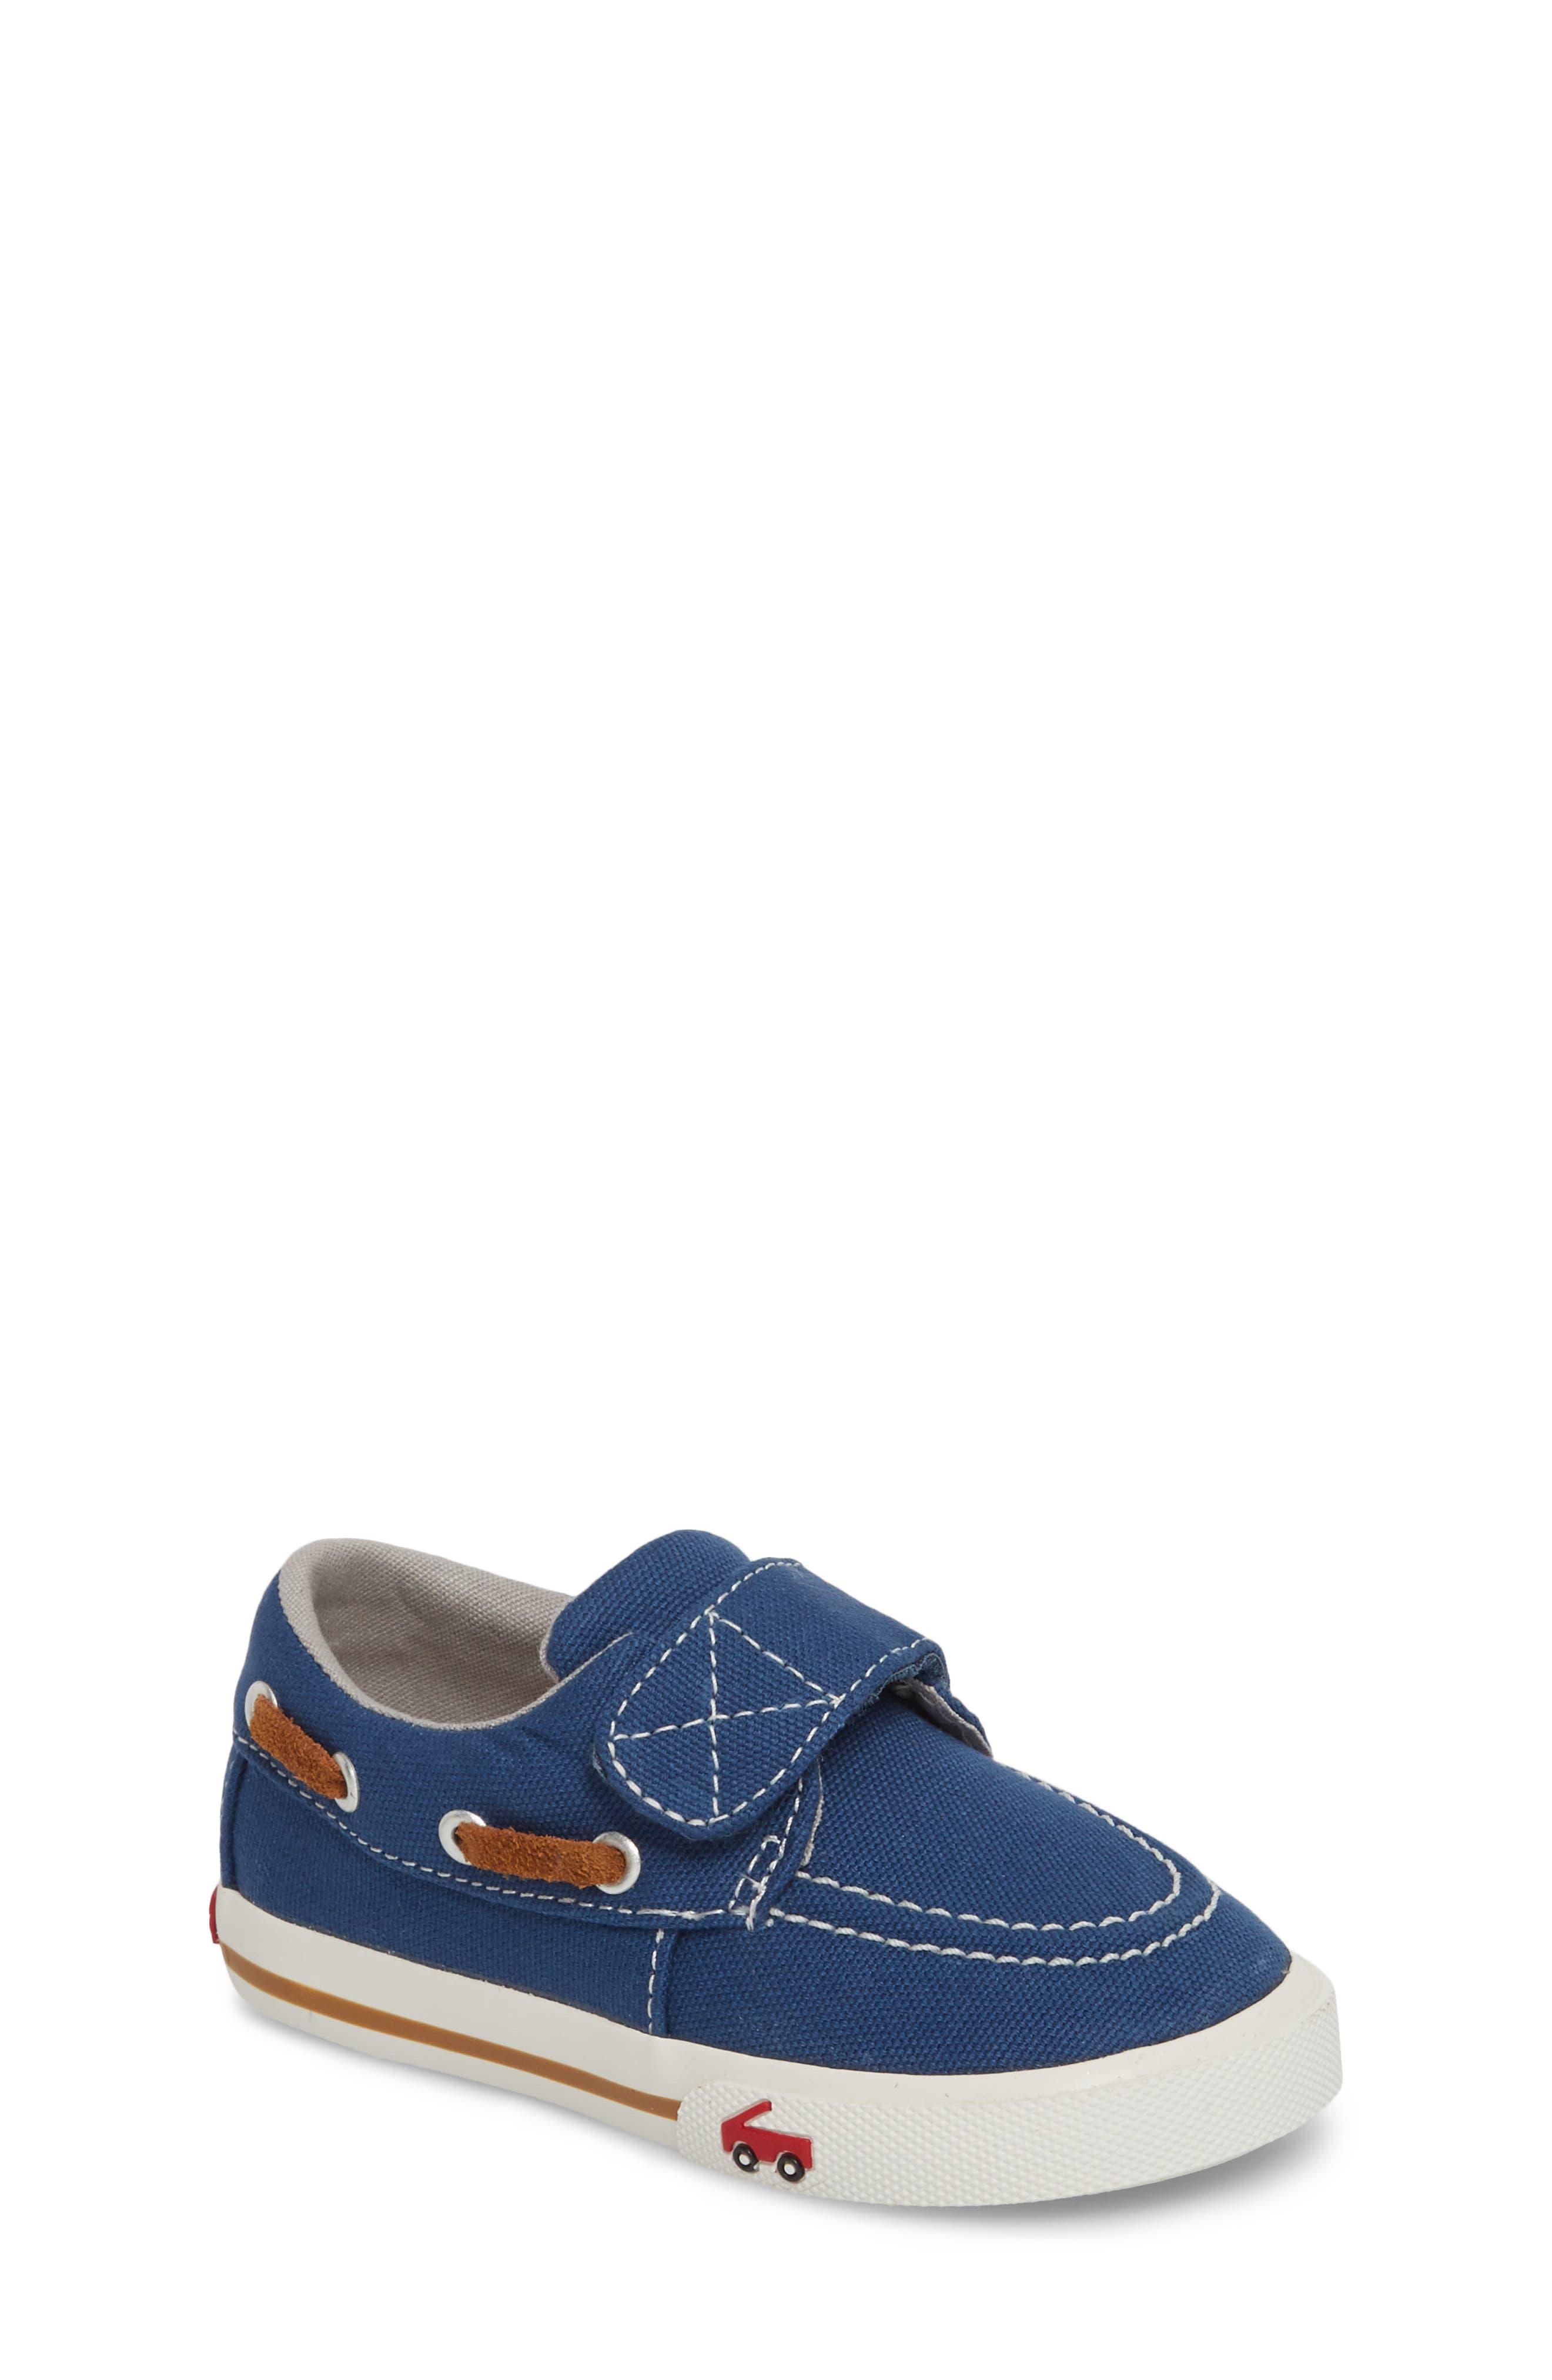 Elias Sneaker,                         Main,                         color, Blue